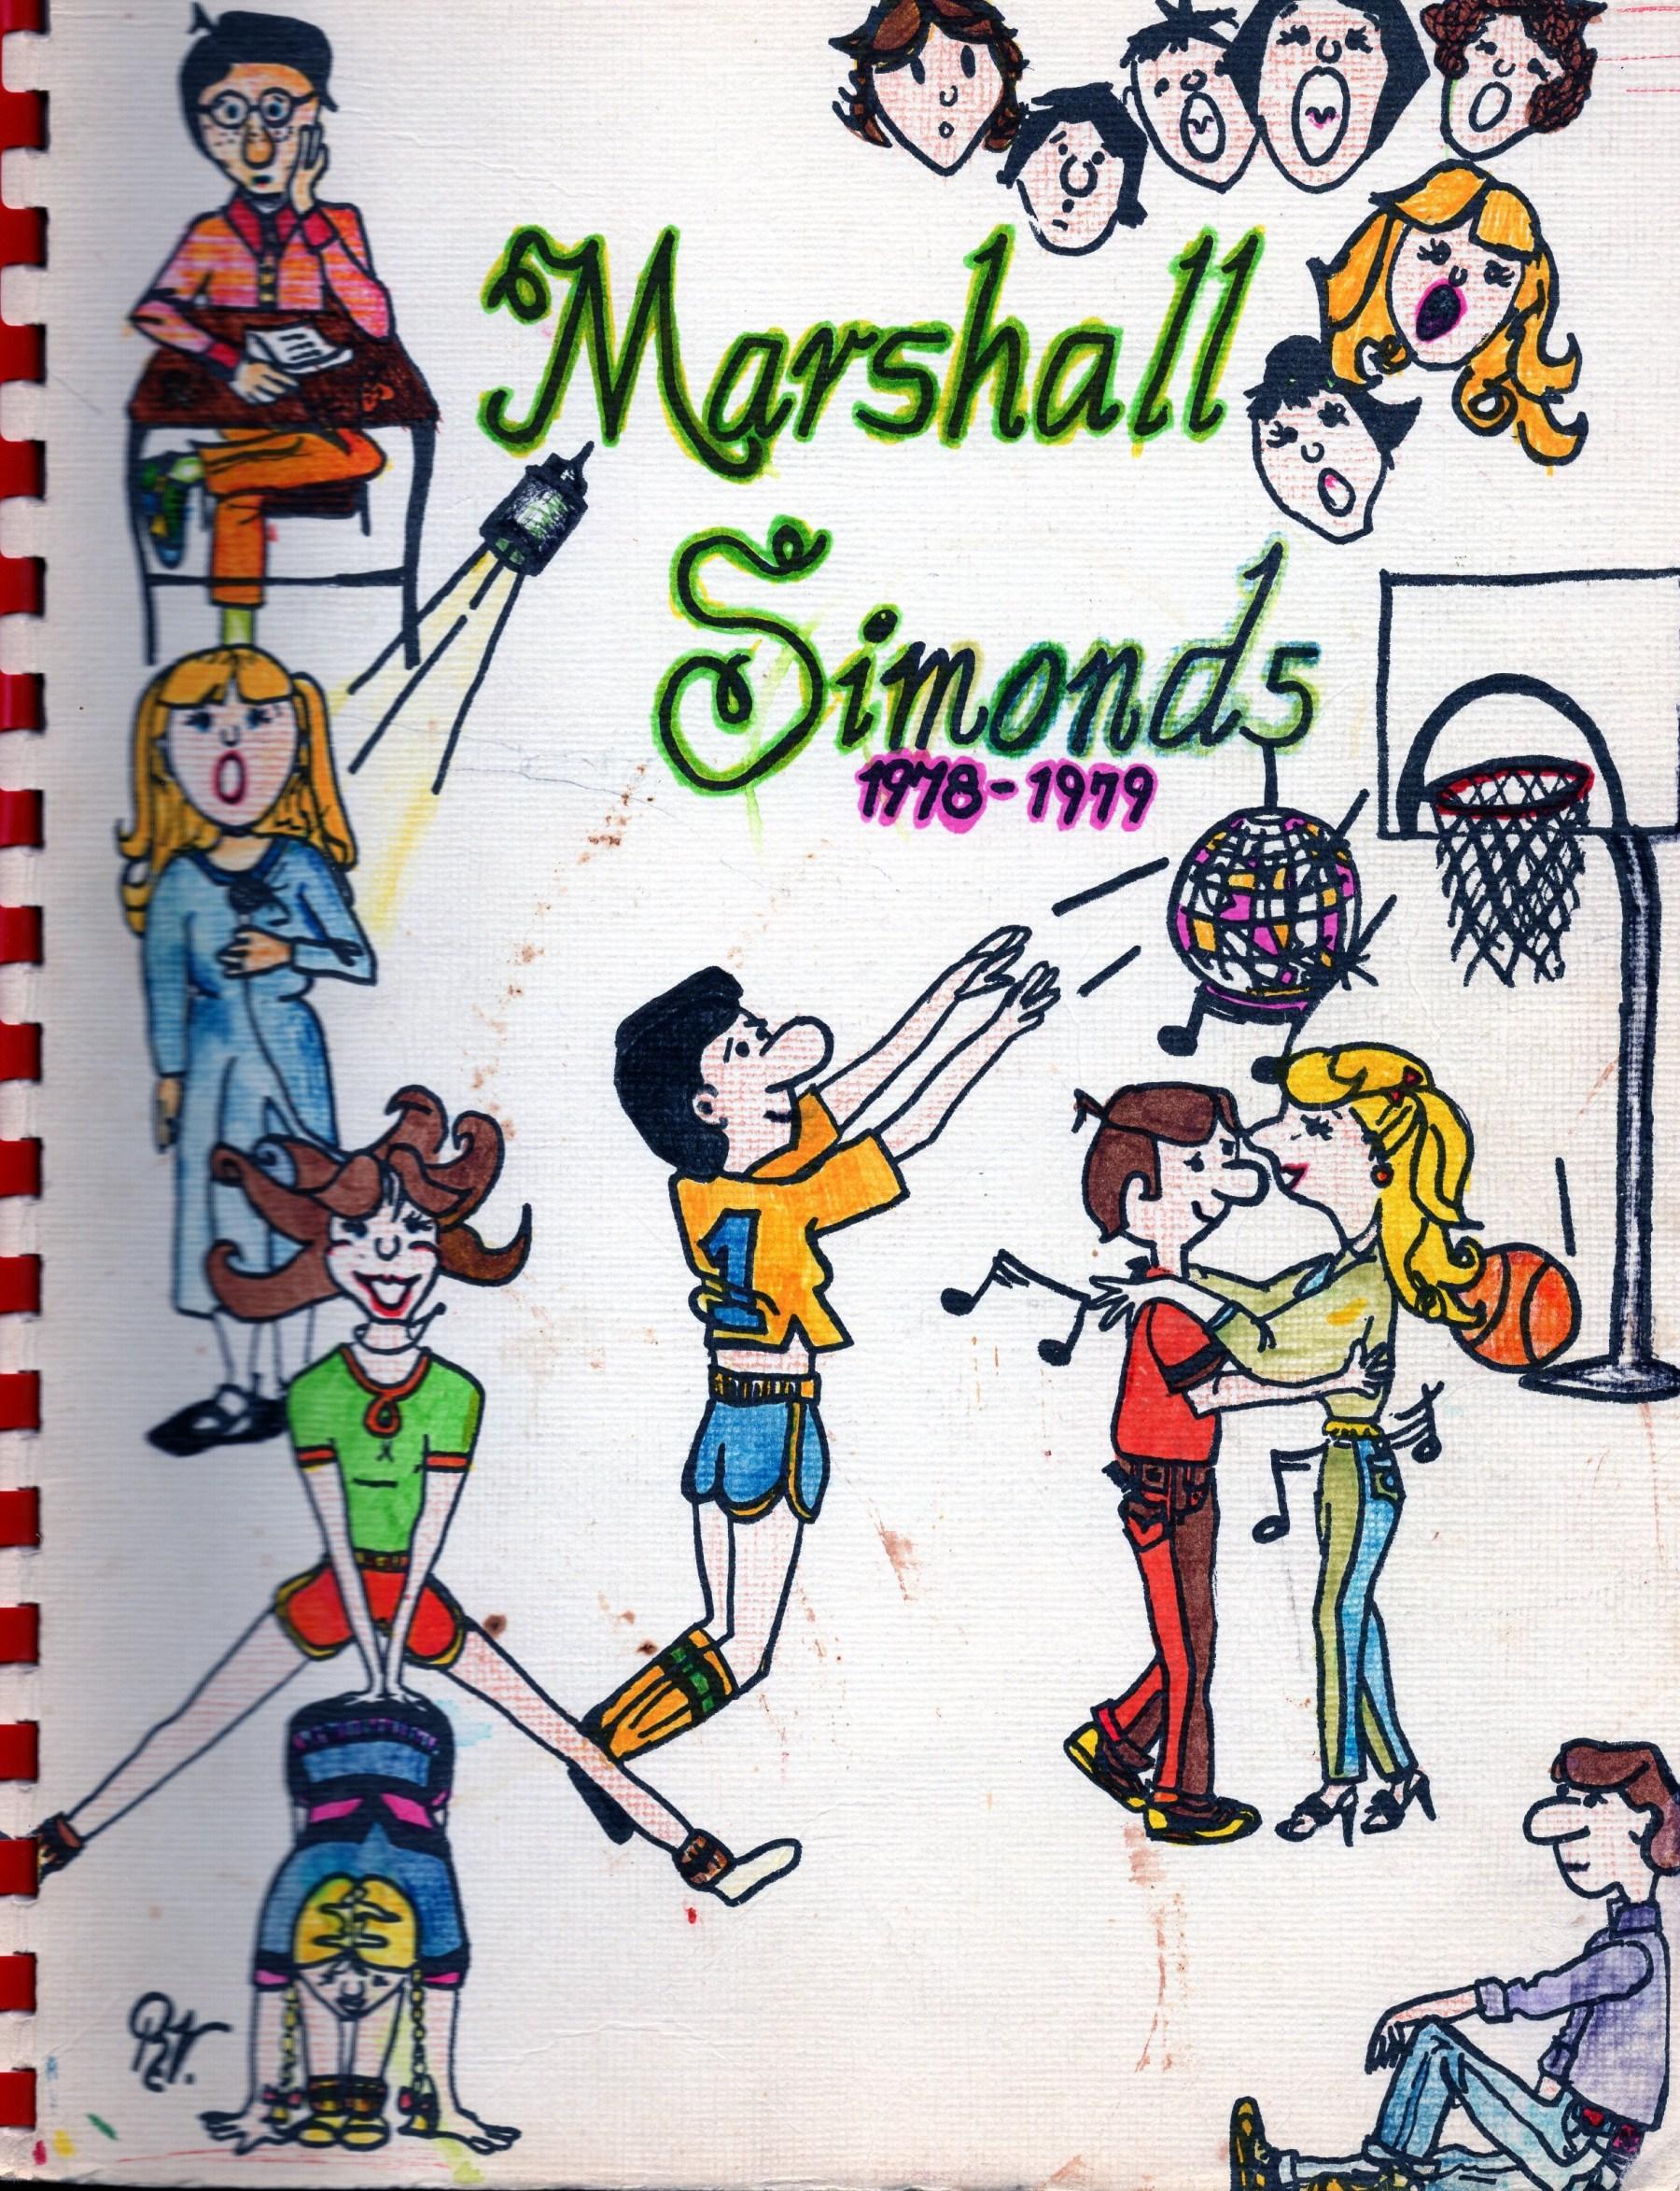 Marshall Simonds Middle School Burlington MA yearbook 1978-1979